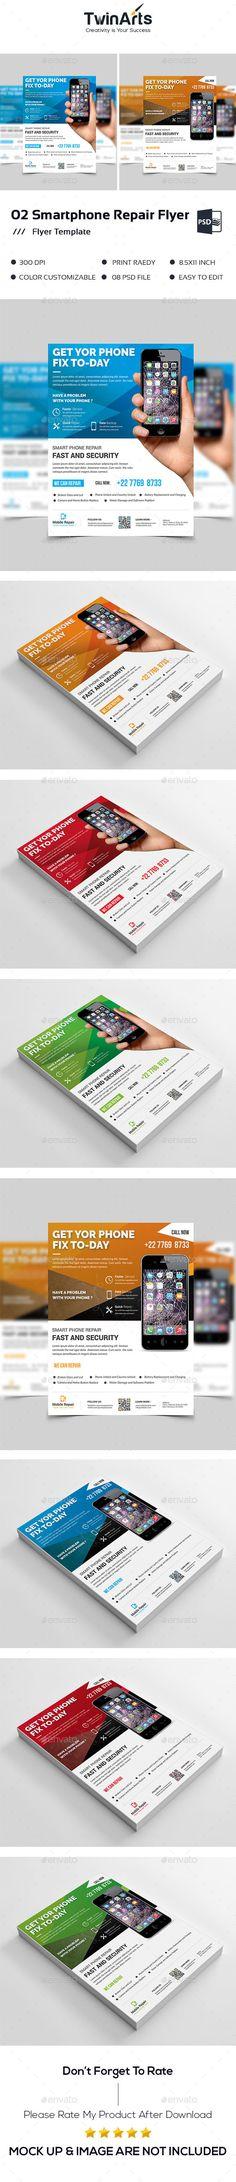 Smartphone Repair Flyer Template PSD